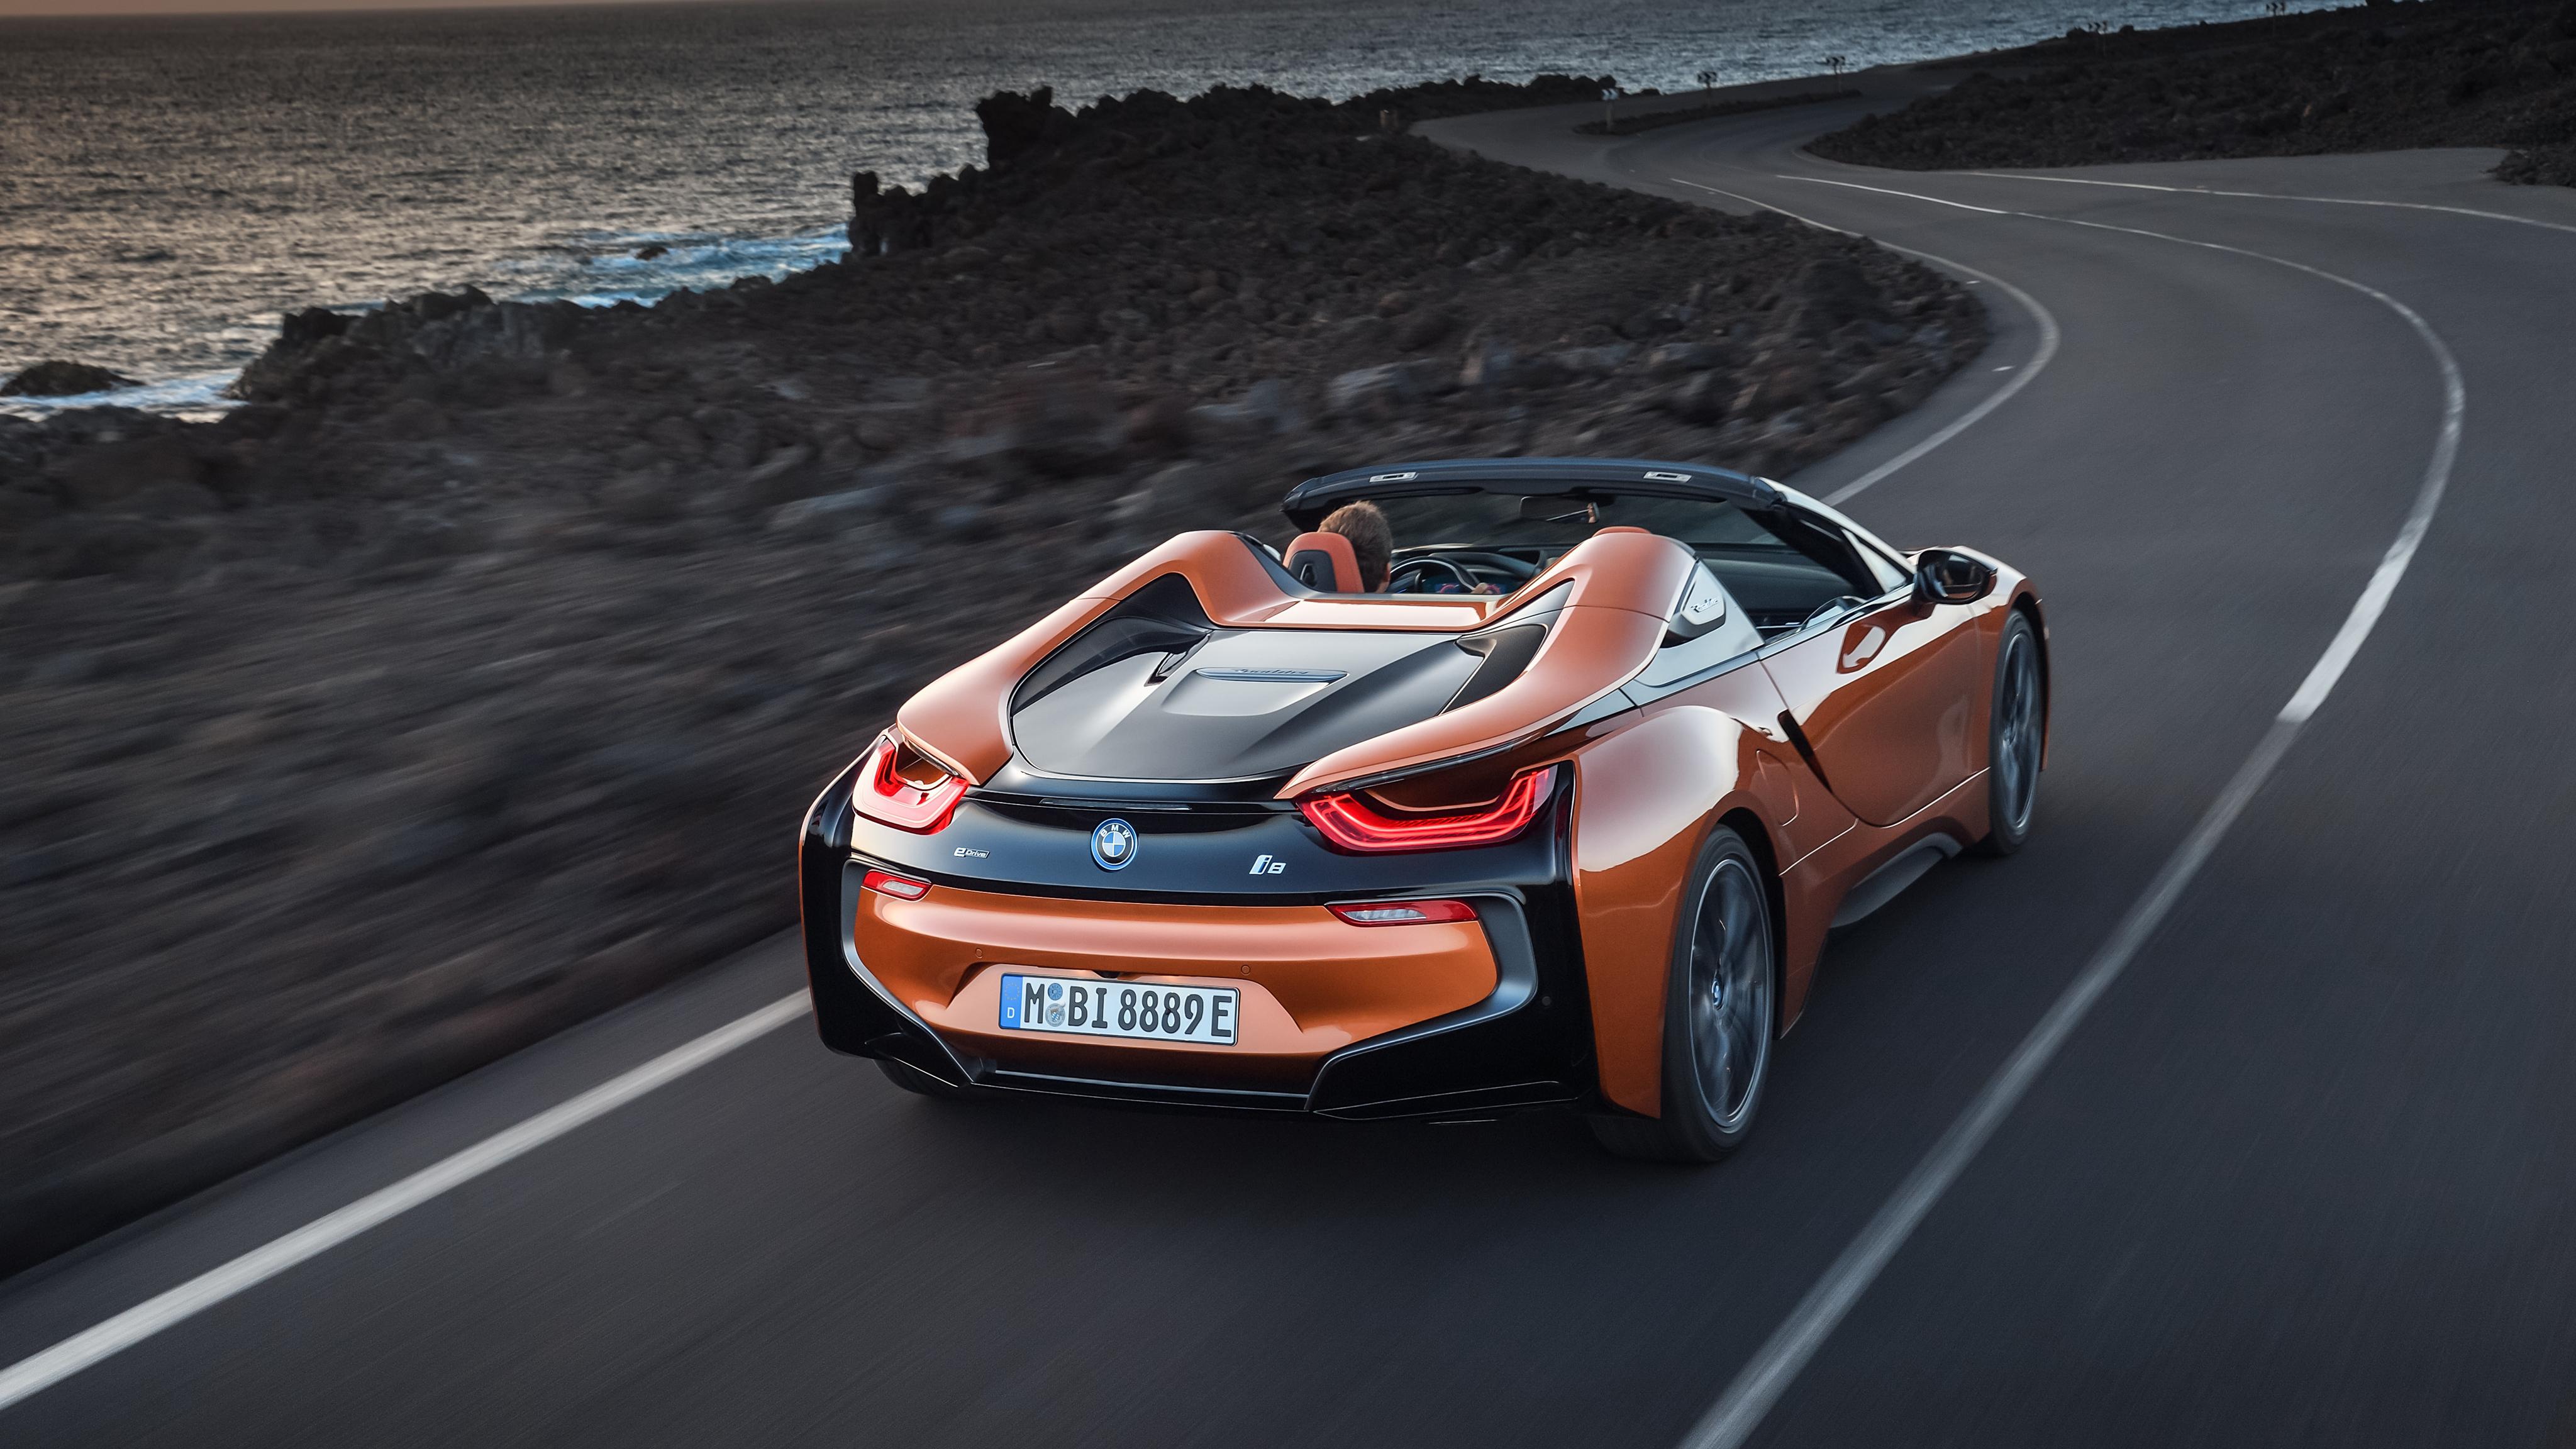 2018 Best Car Wallpapers: 2018 BMW I8 Roadster 4K 2 Wallpaper